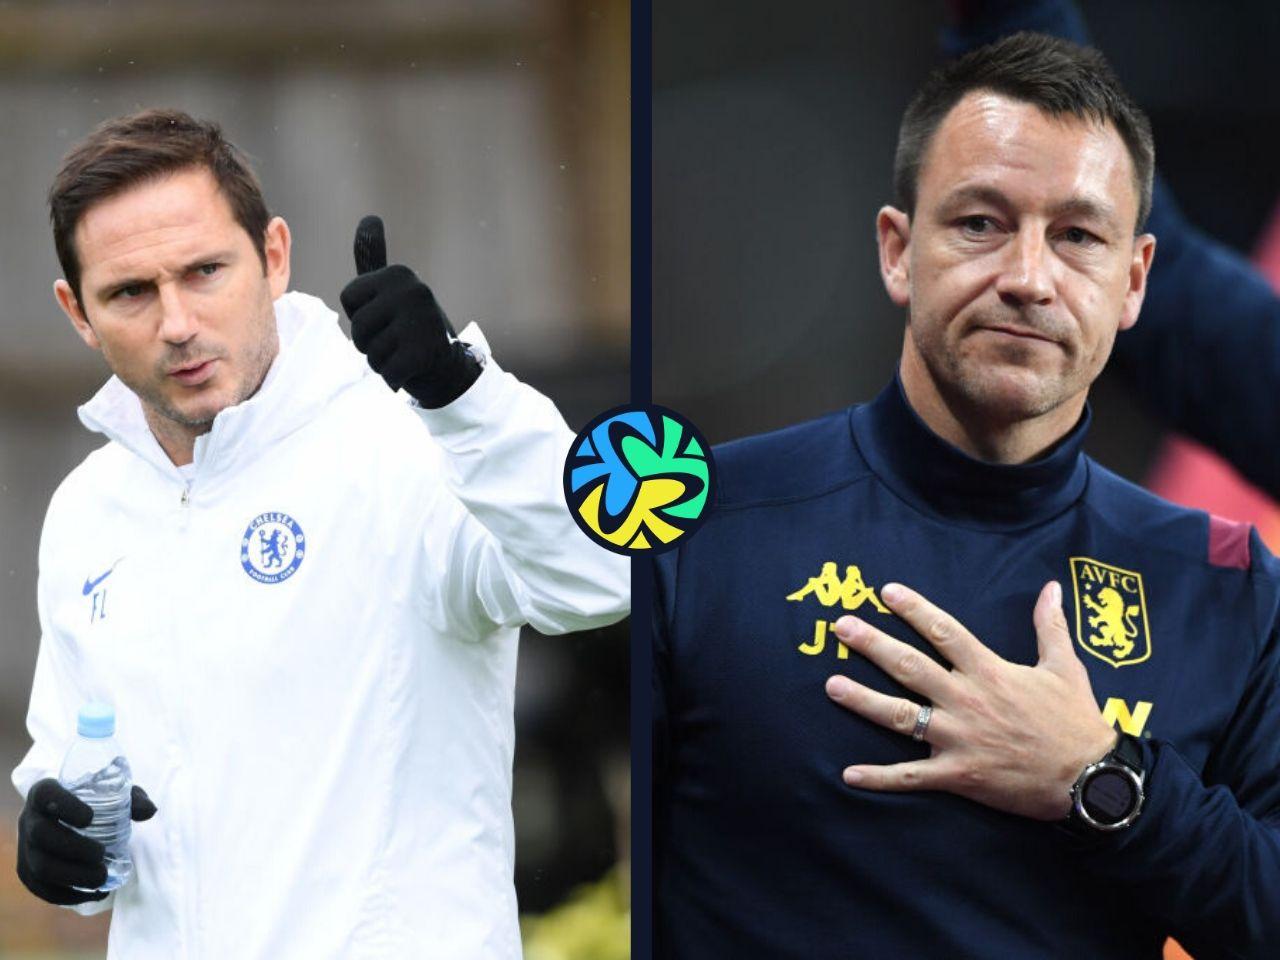 Match Preview: Chelsea vs Aston Villa - Ronaldo.com